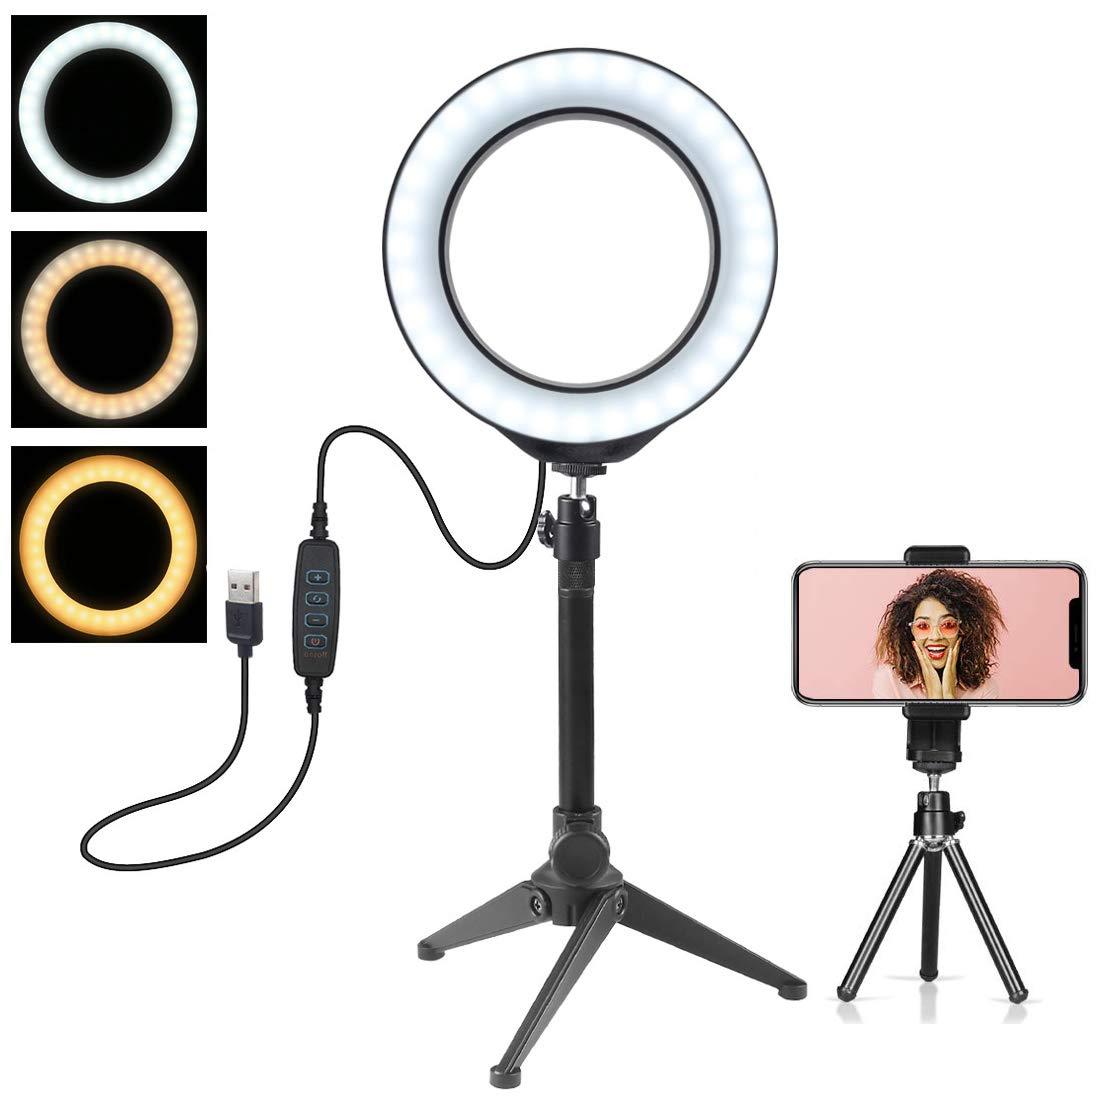 Mini c/ámara de luz LED con Soporte para tel/éfono Celular L/ámpara LED de Escritorio con 3 Modos de luz y 10 Niveles de Brillo Anillo de luz LED 6.216cm con tr/ípode para Video y Maquillaje de Youtube